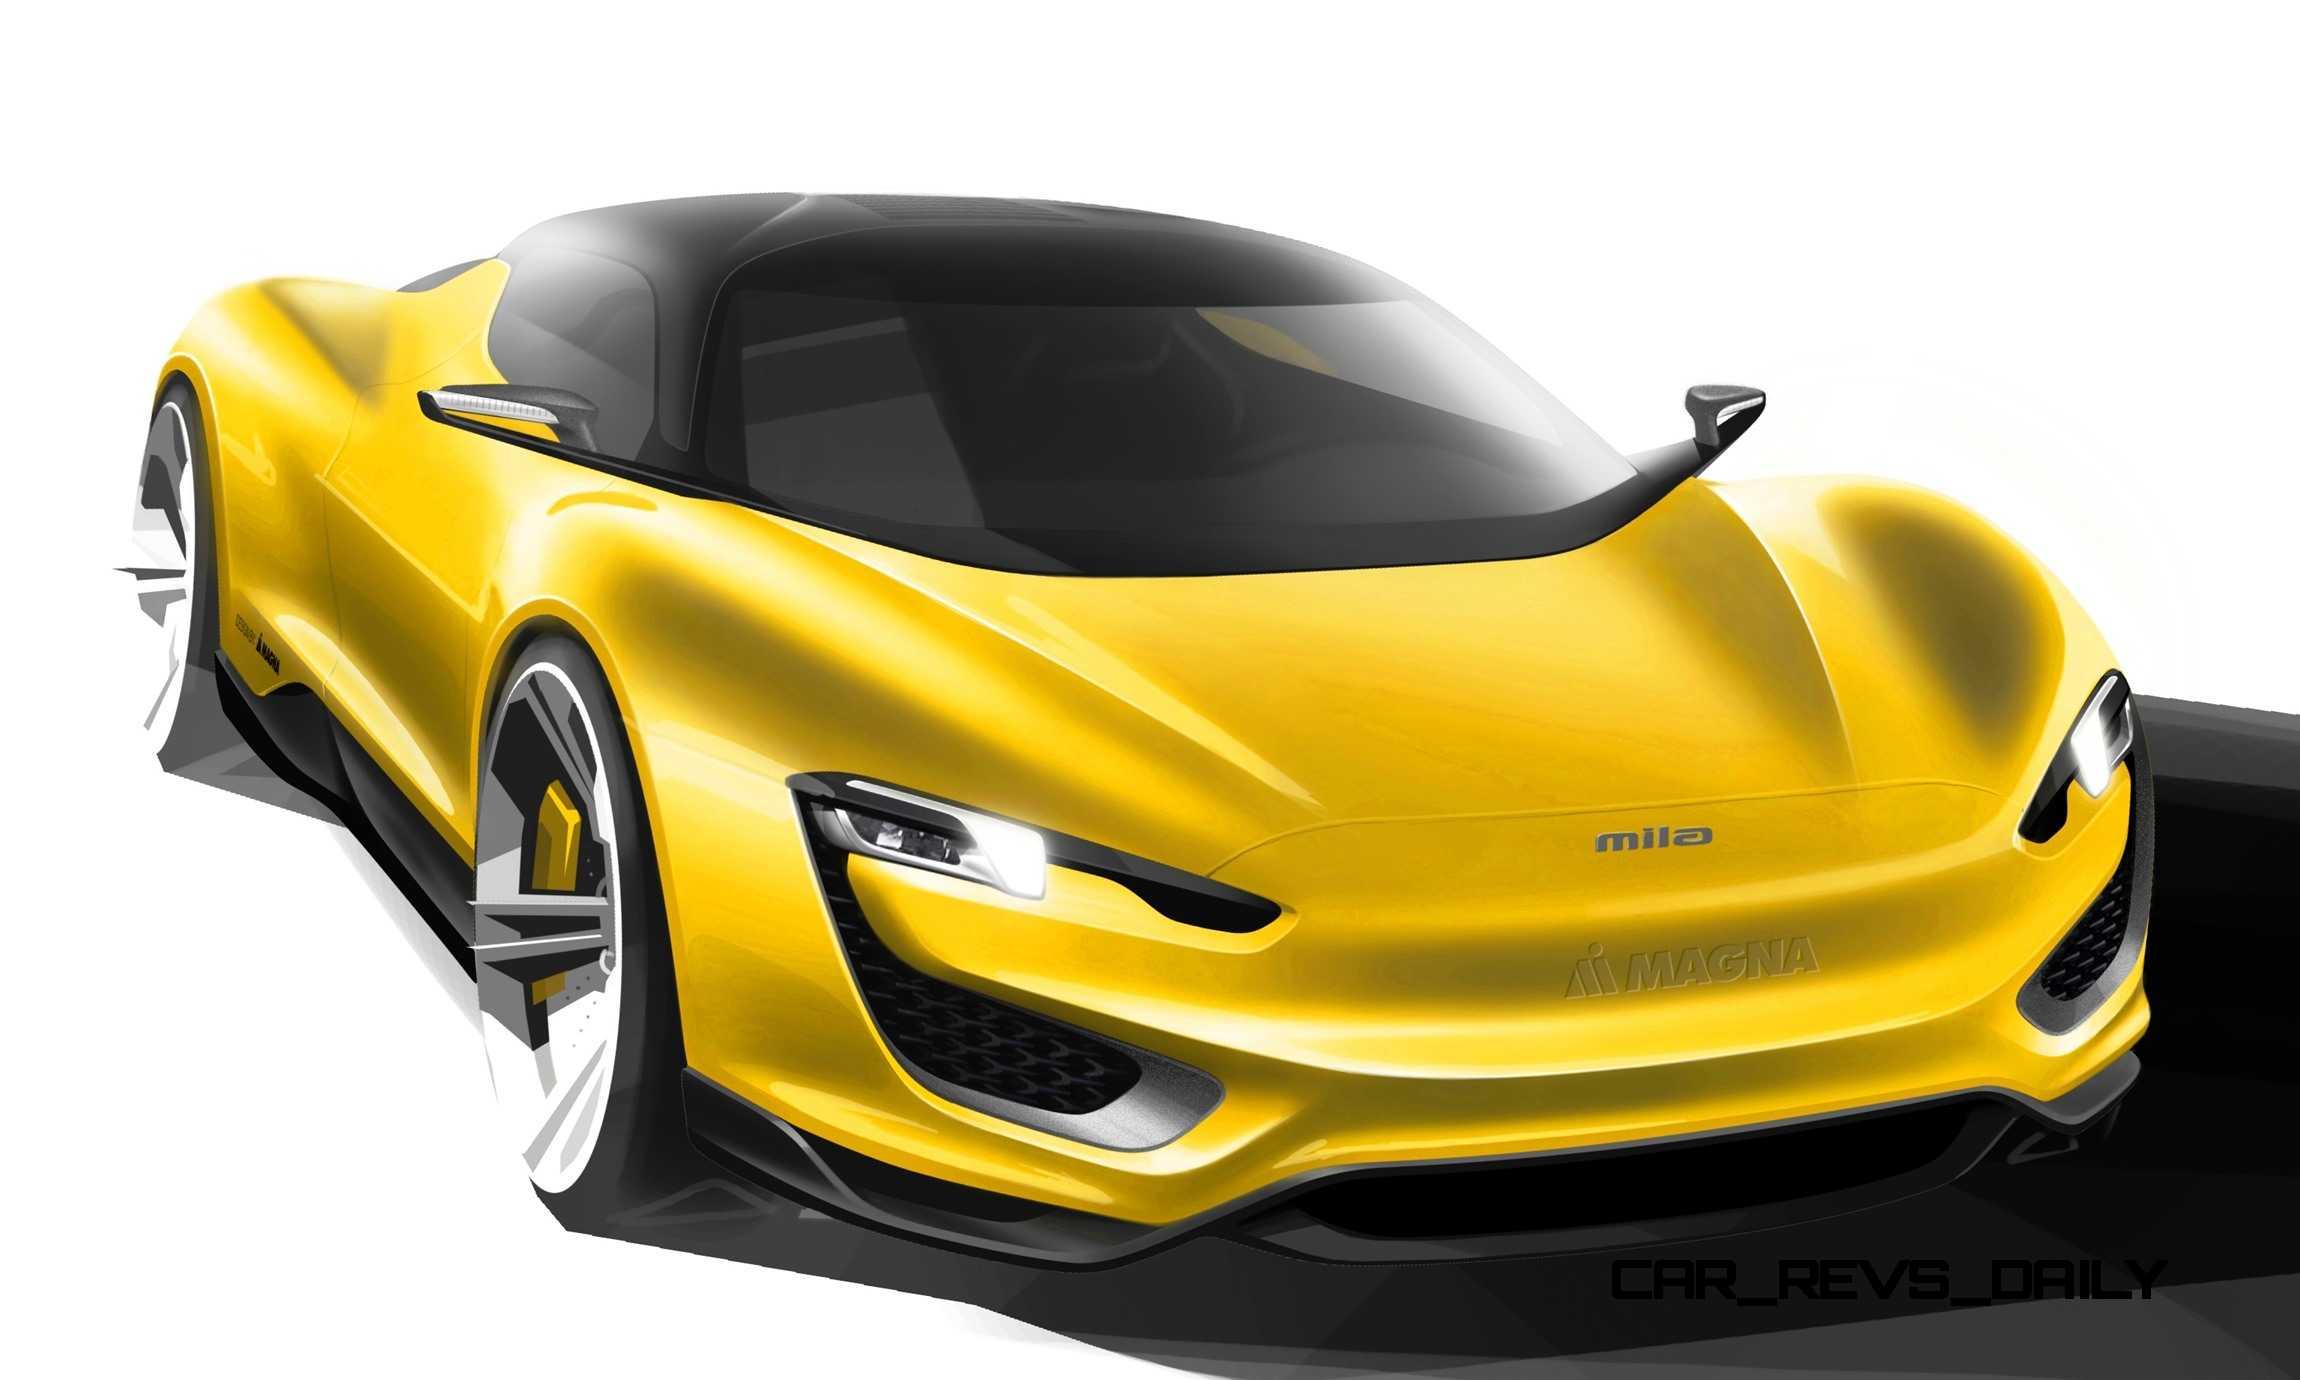 2015 Magna Steyr Mila Plus